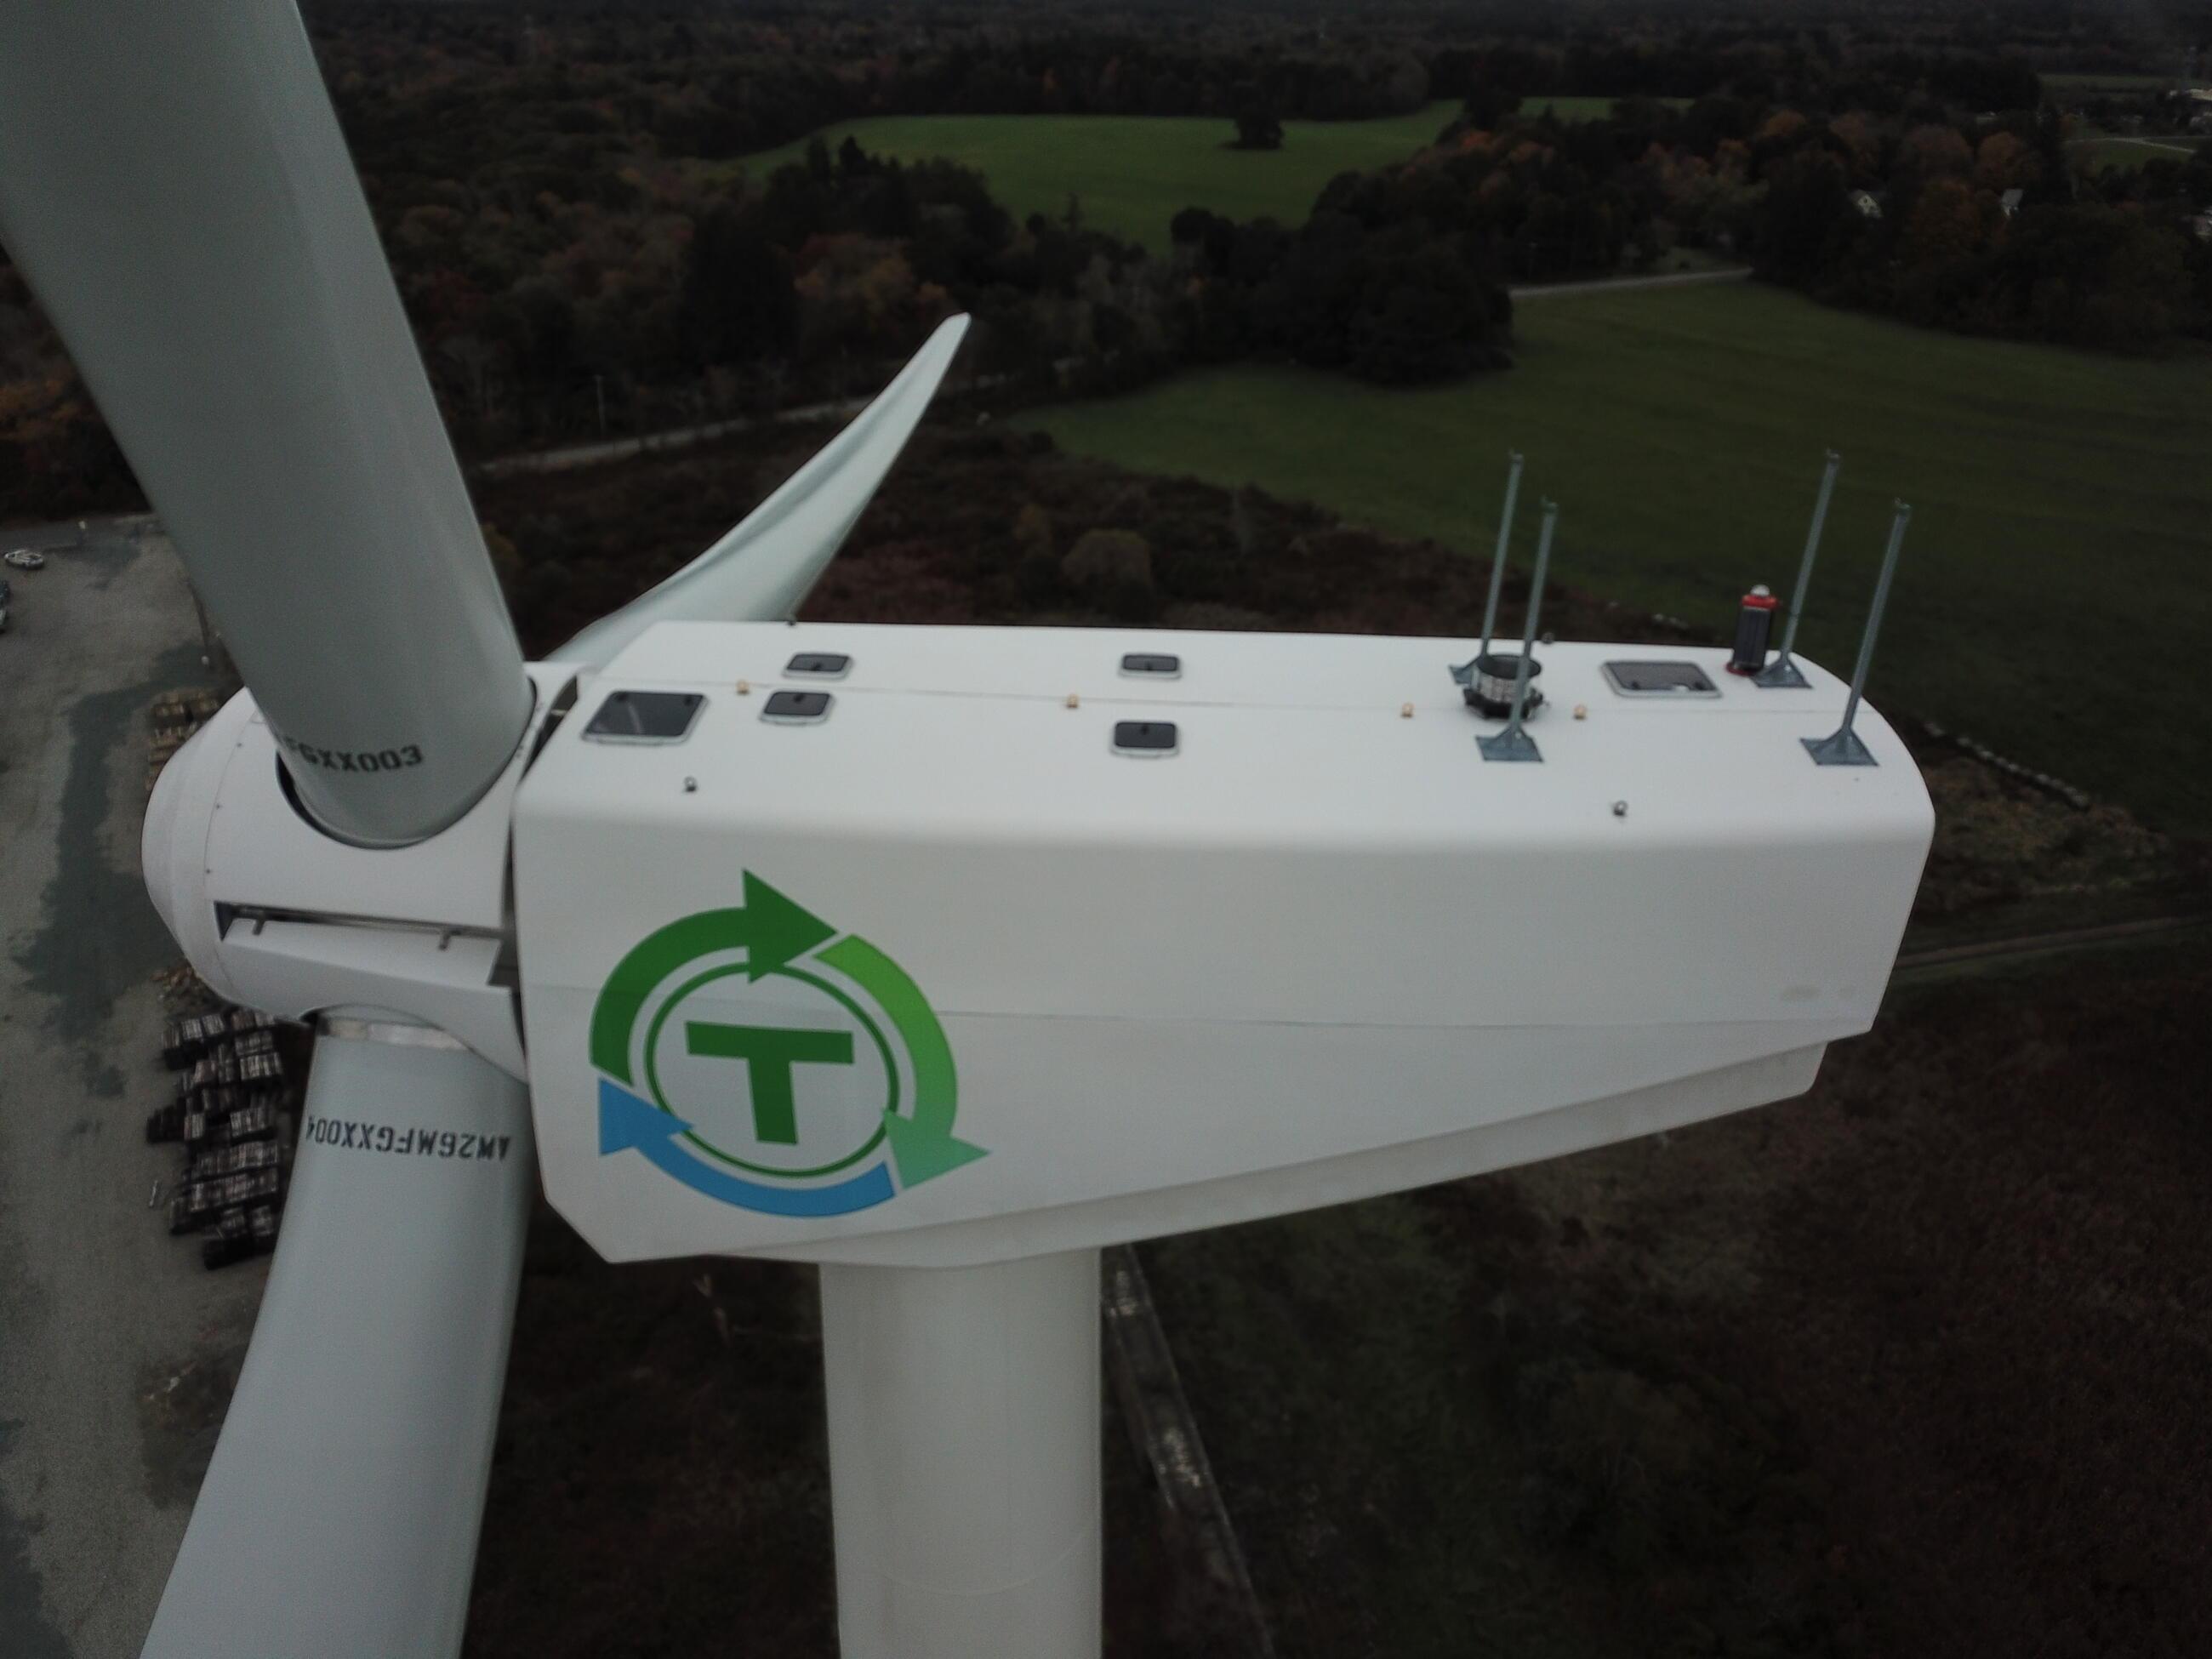 Close up view of the MBTA's wind turbine in Kingston Massachusetts.